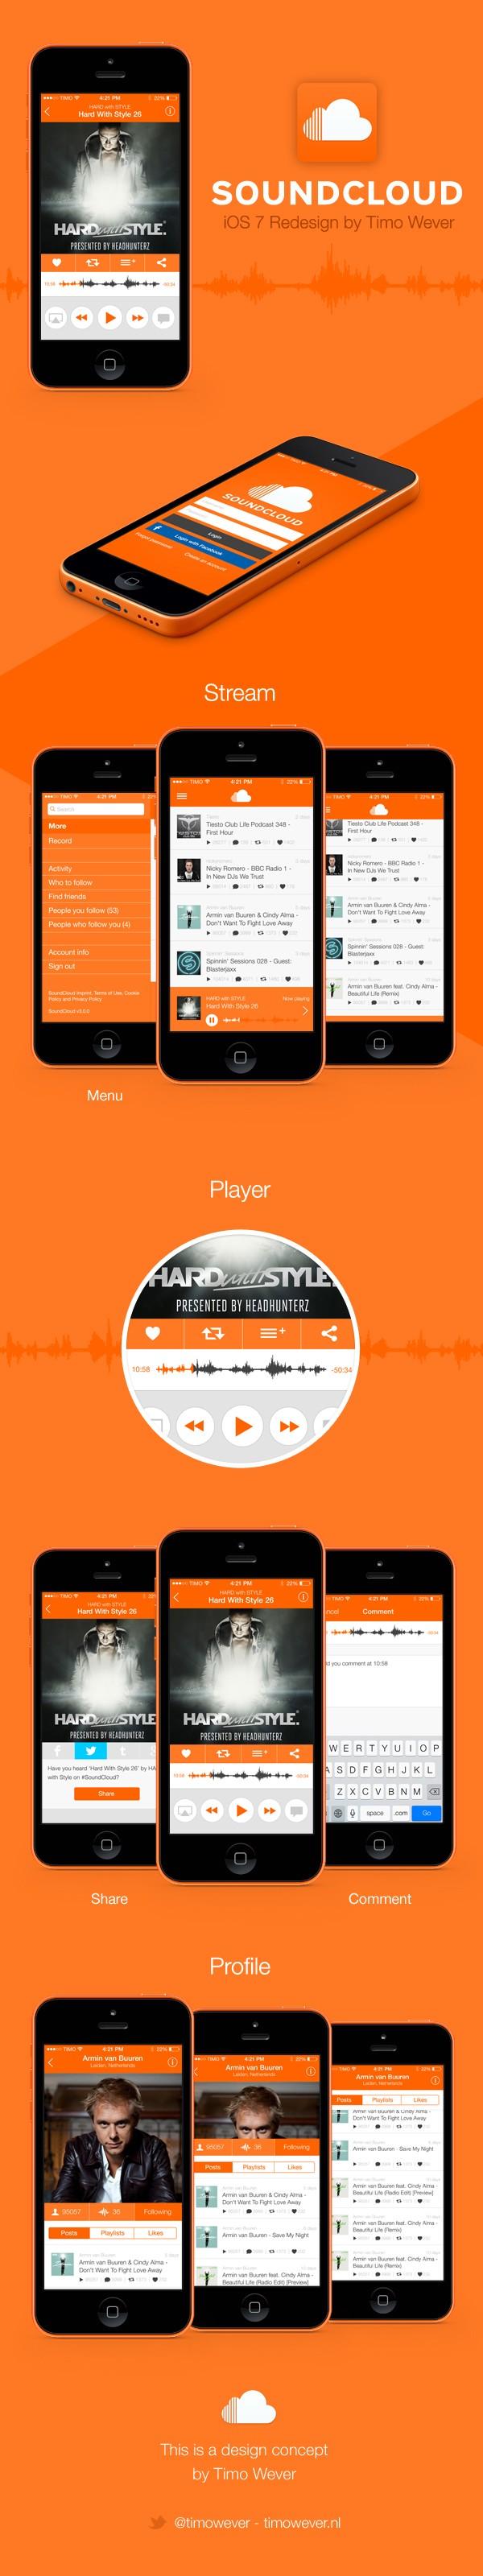 img 52ae557cddd38 Concept: Redesign voor de SoundCloud app van Nederlandse bodem